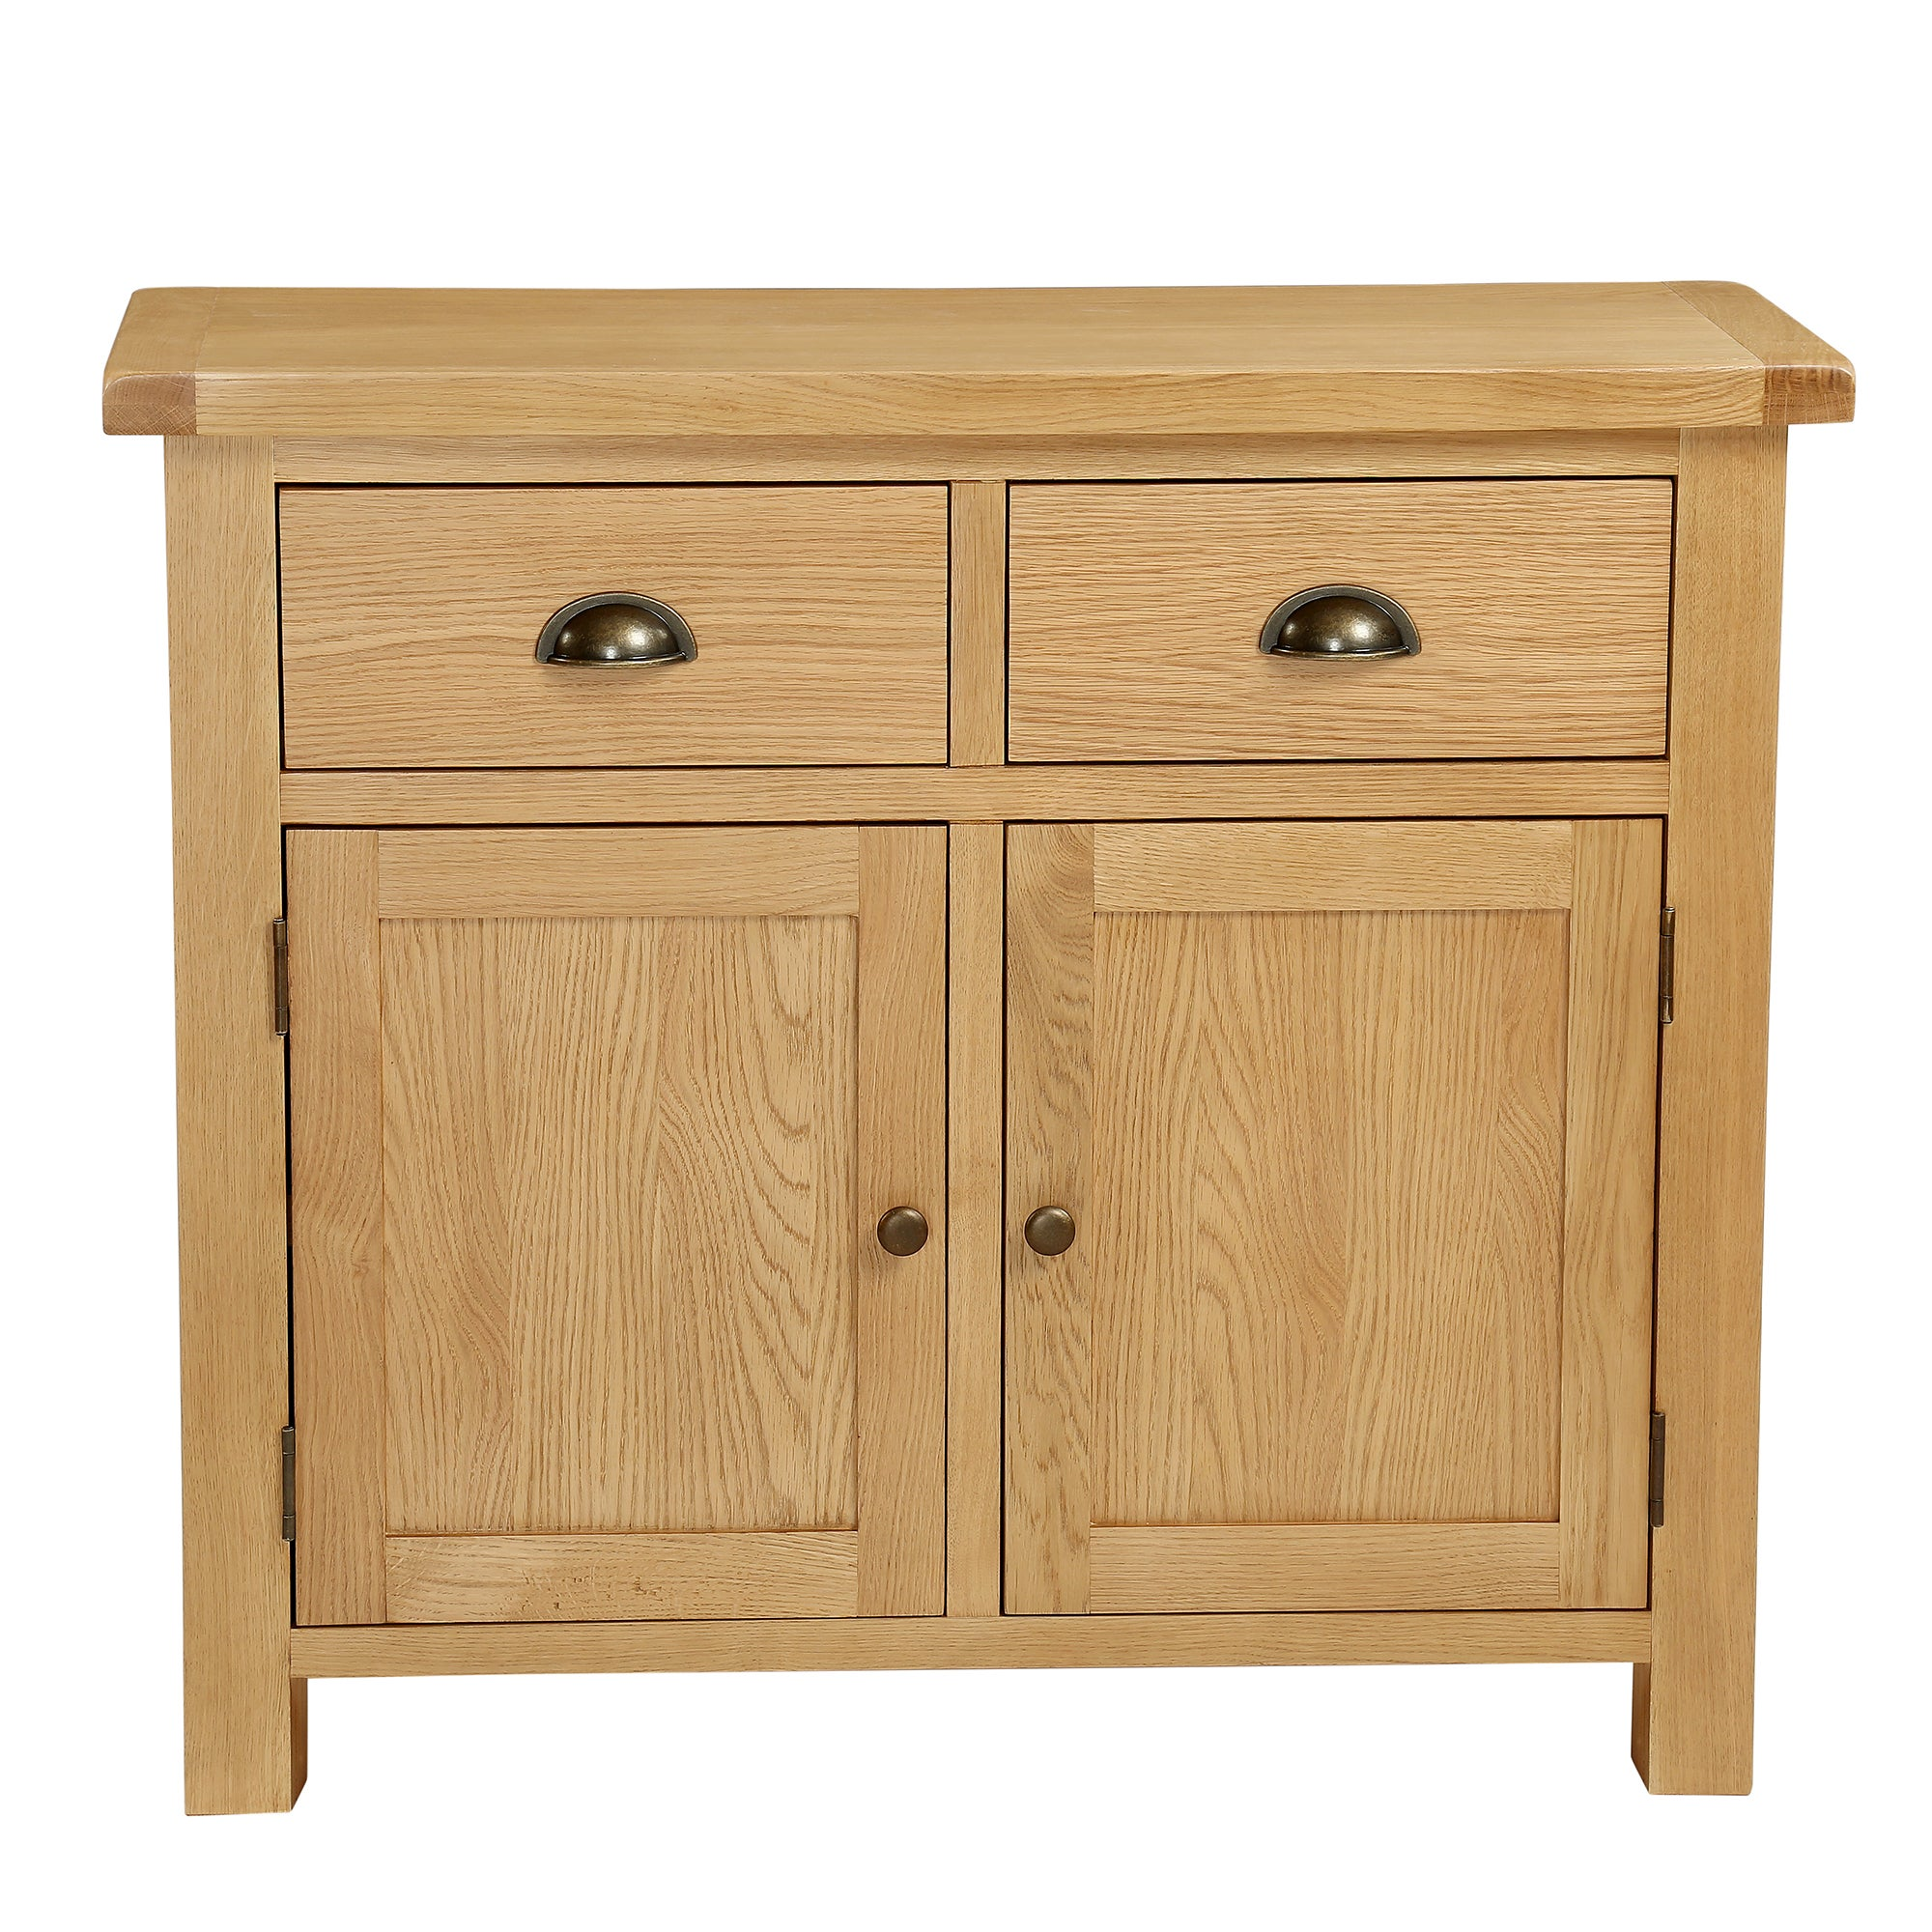 Sherbourne Oak Small Sideboard Natural